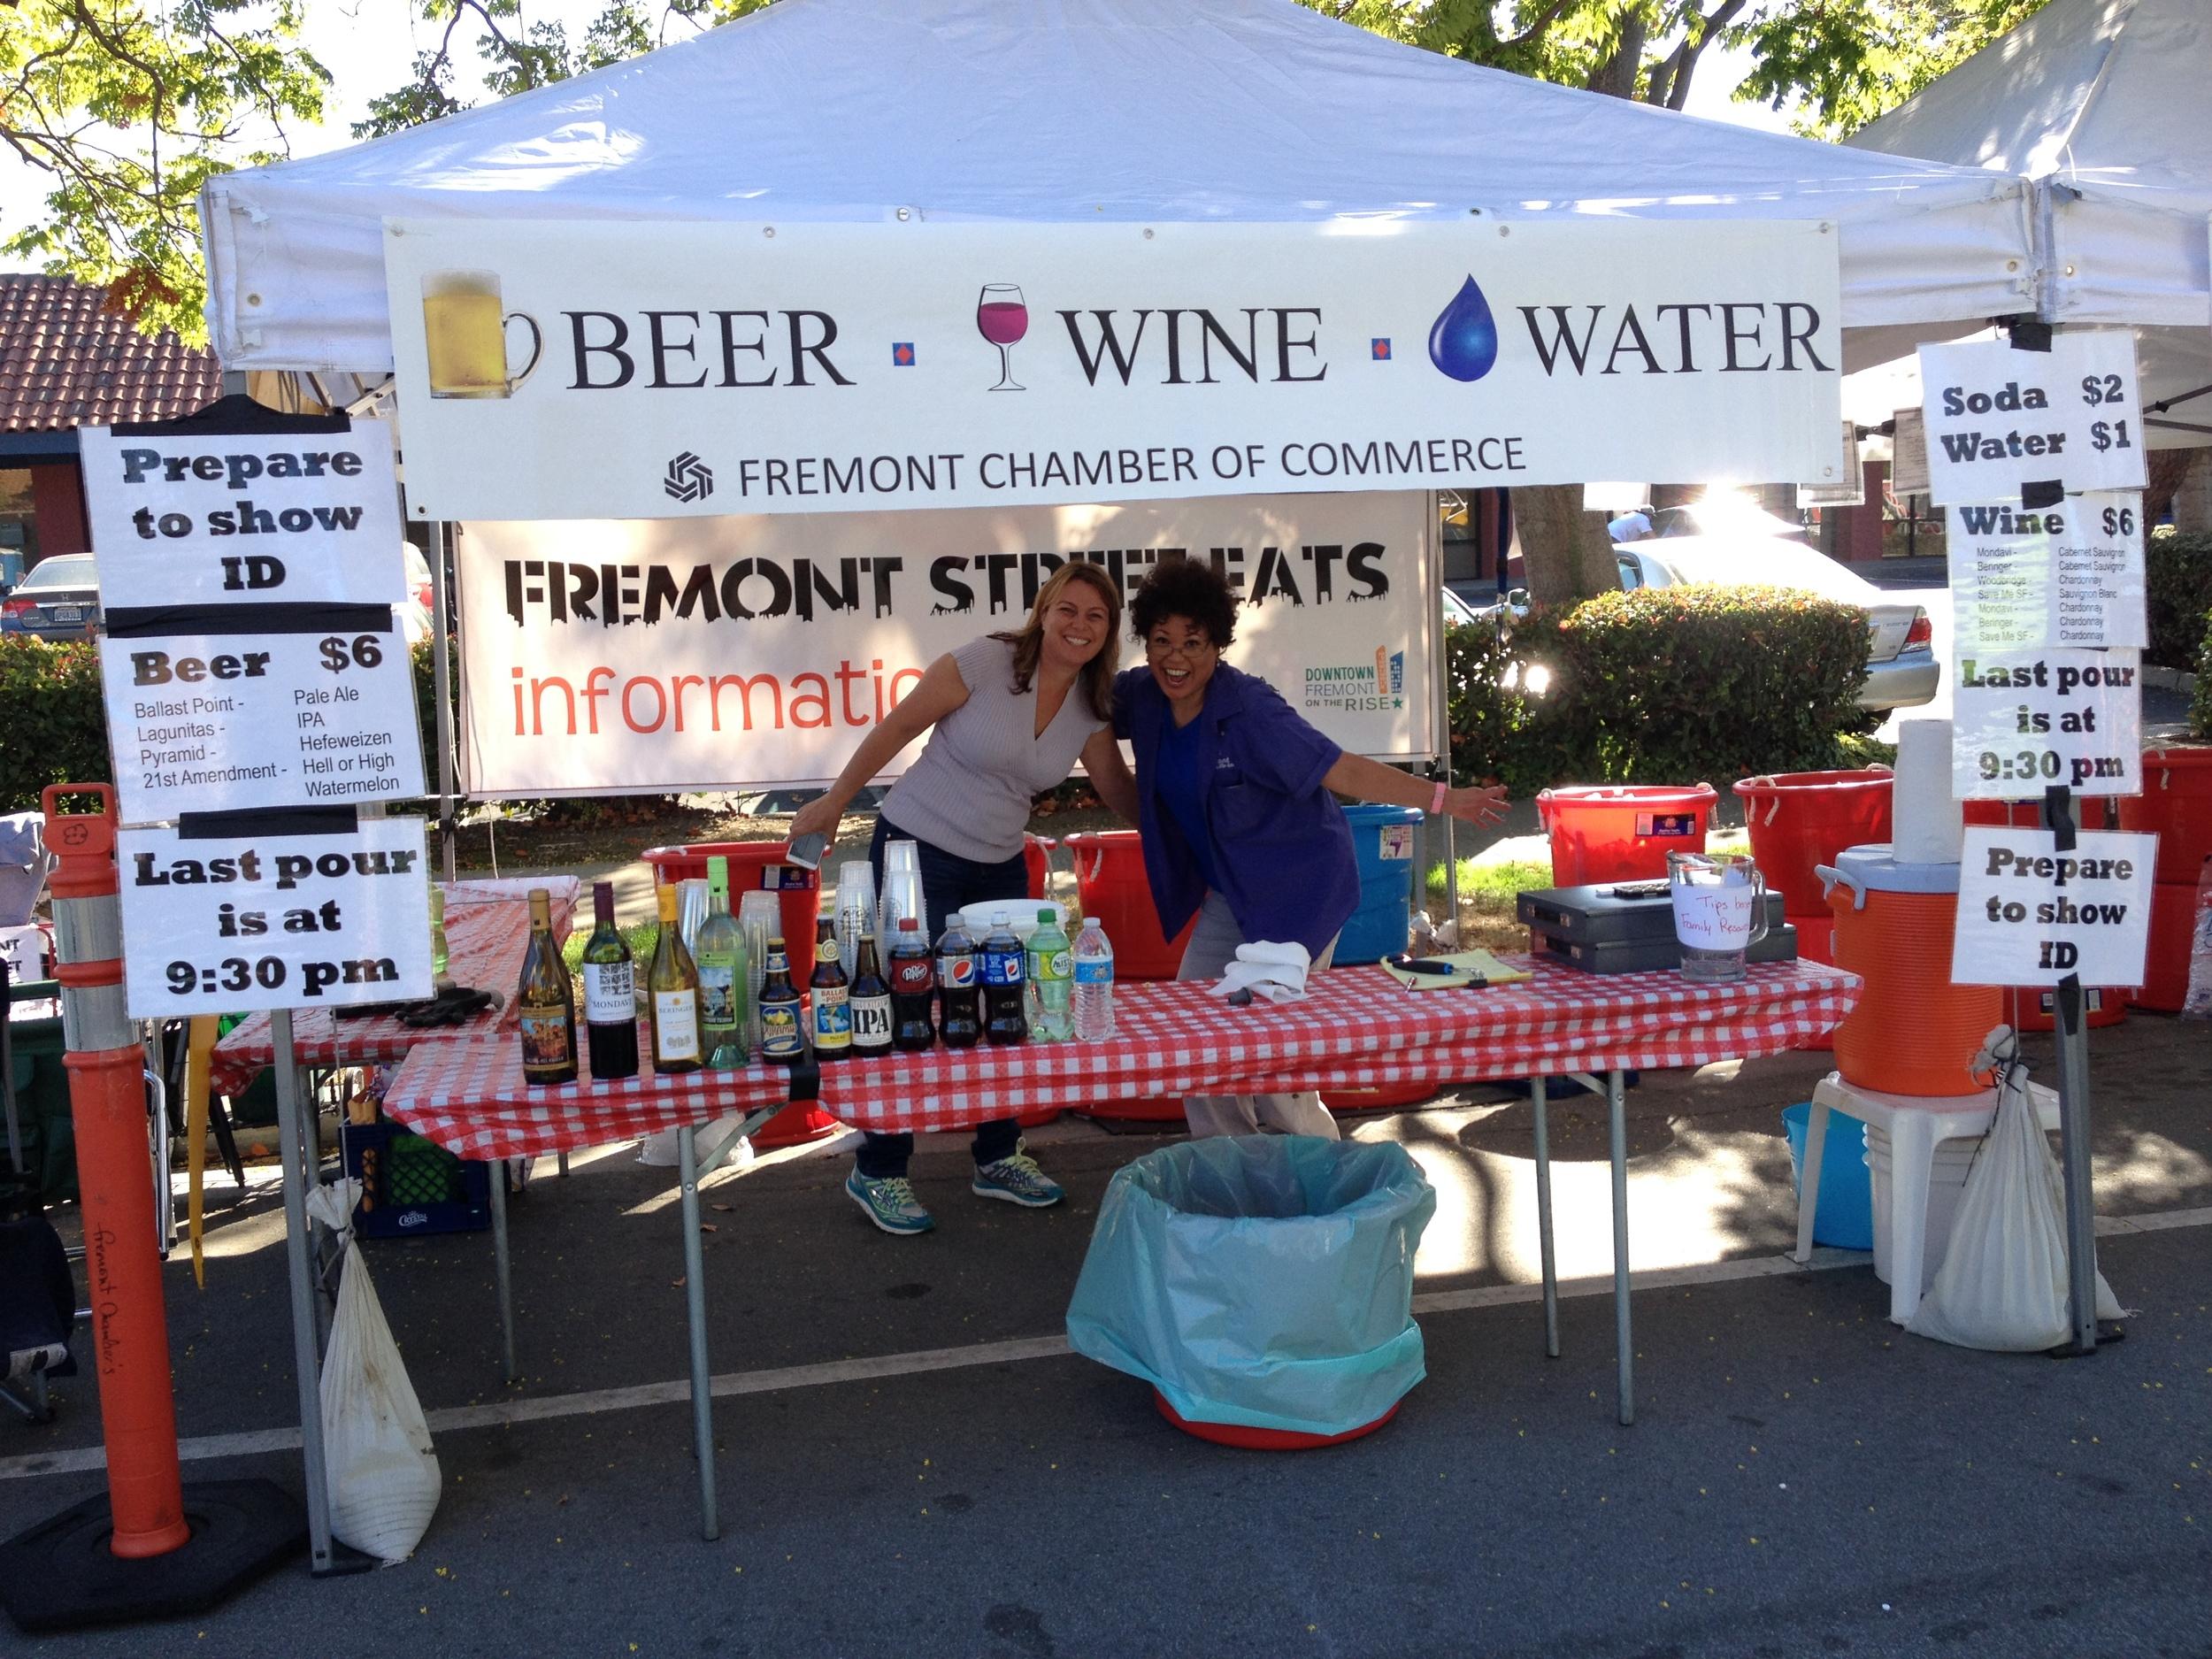 beer wine water tent.jpg